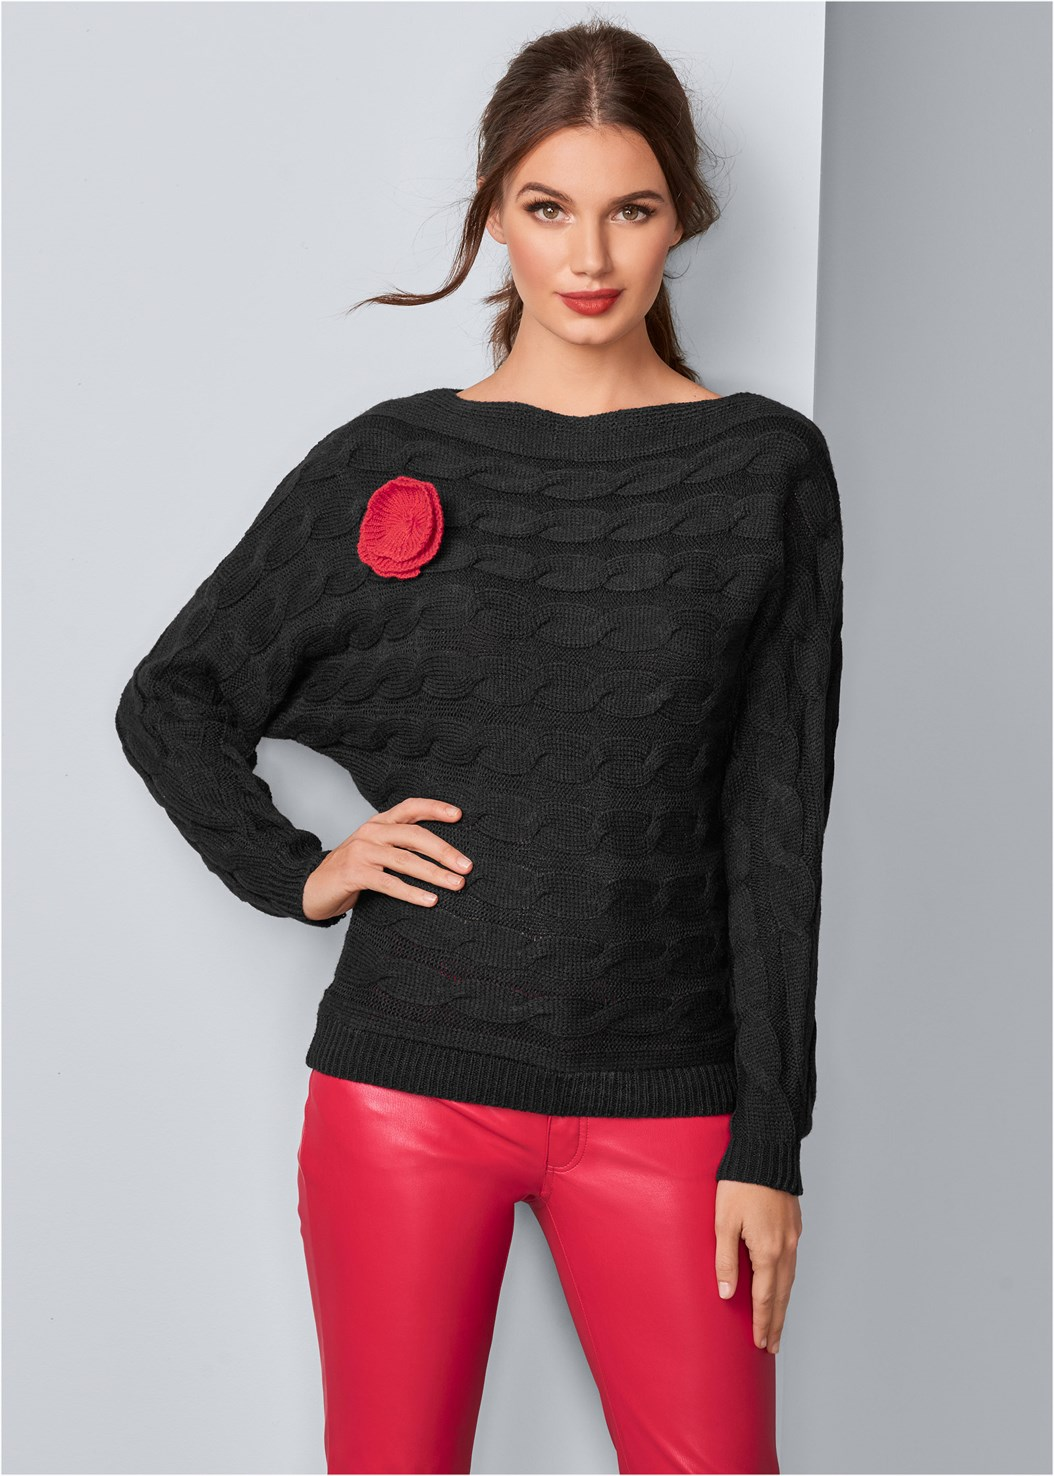 Rose Applique Sweater,Faux Leather Pants